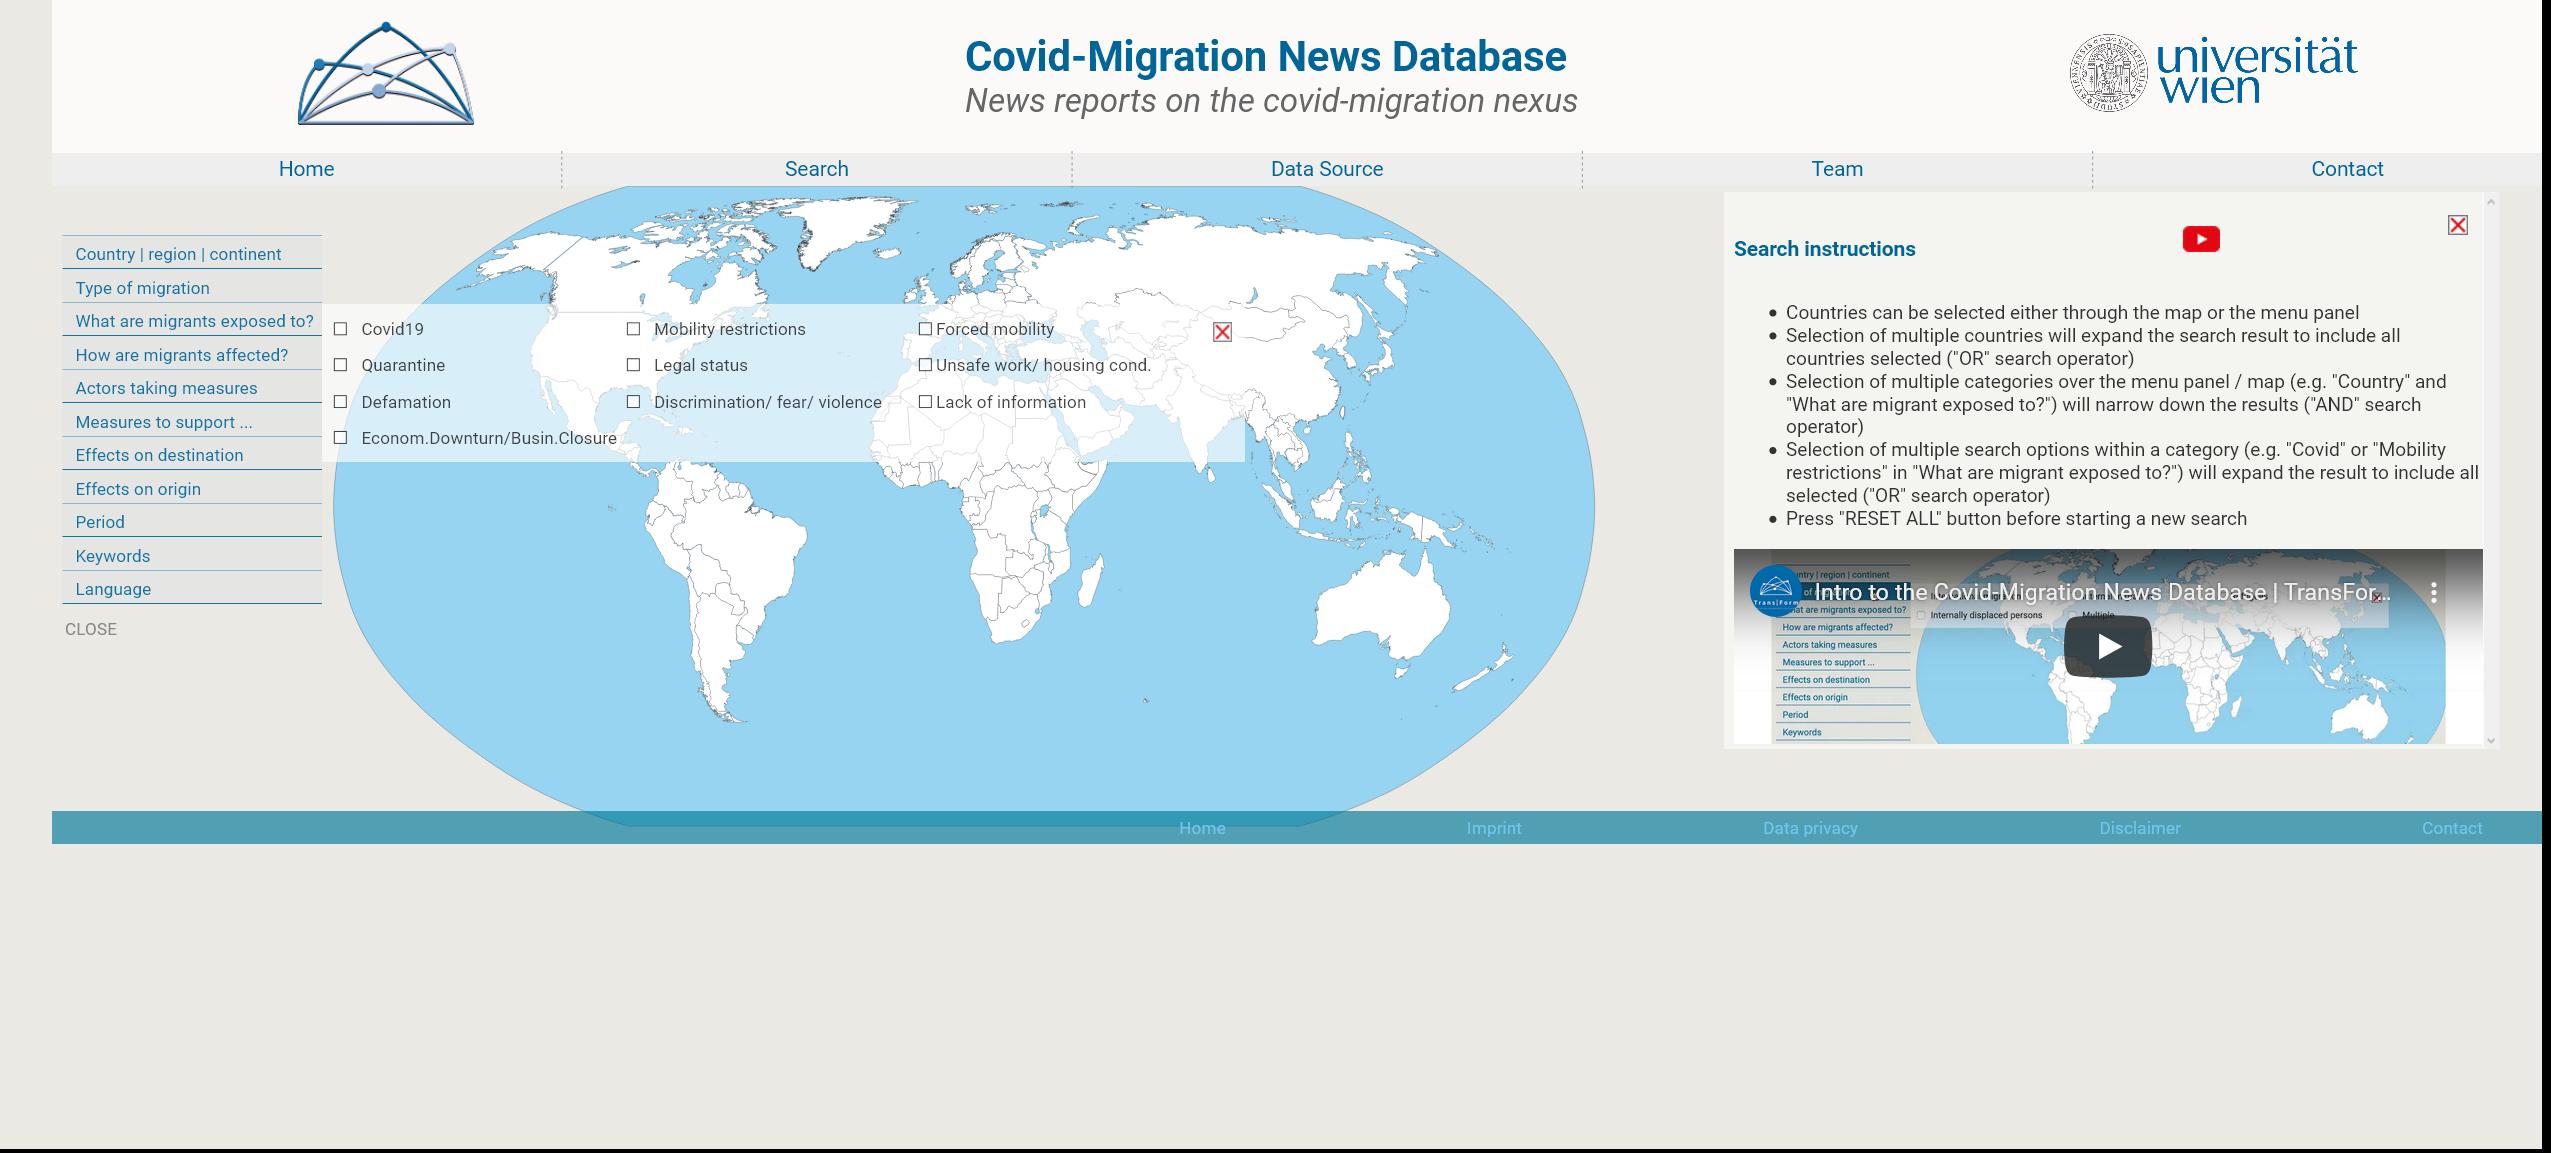 COVID-migration news database